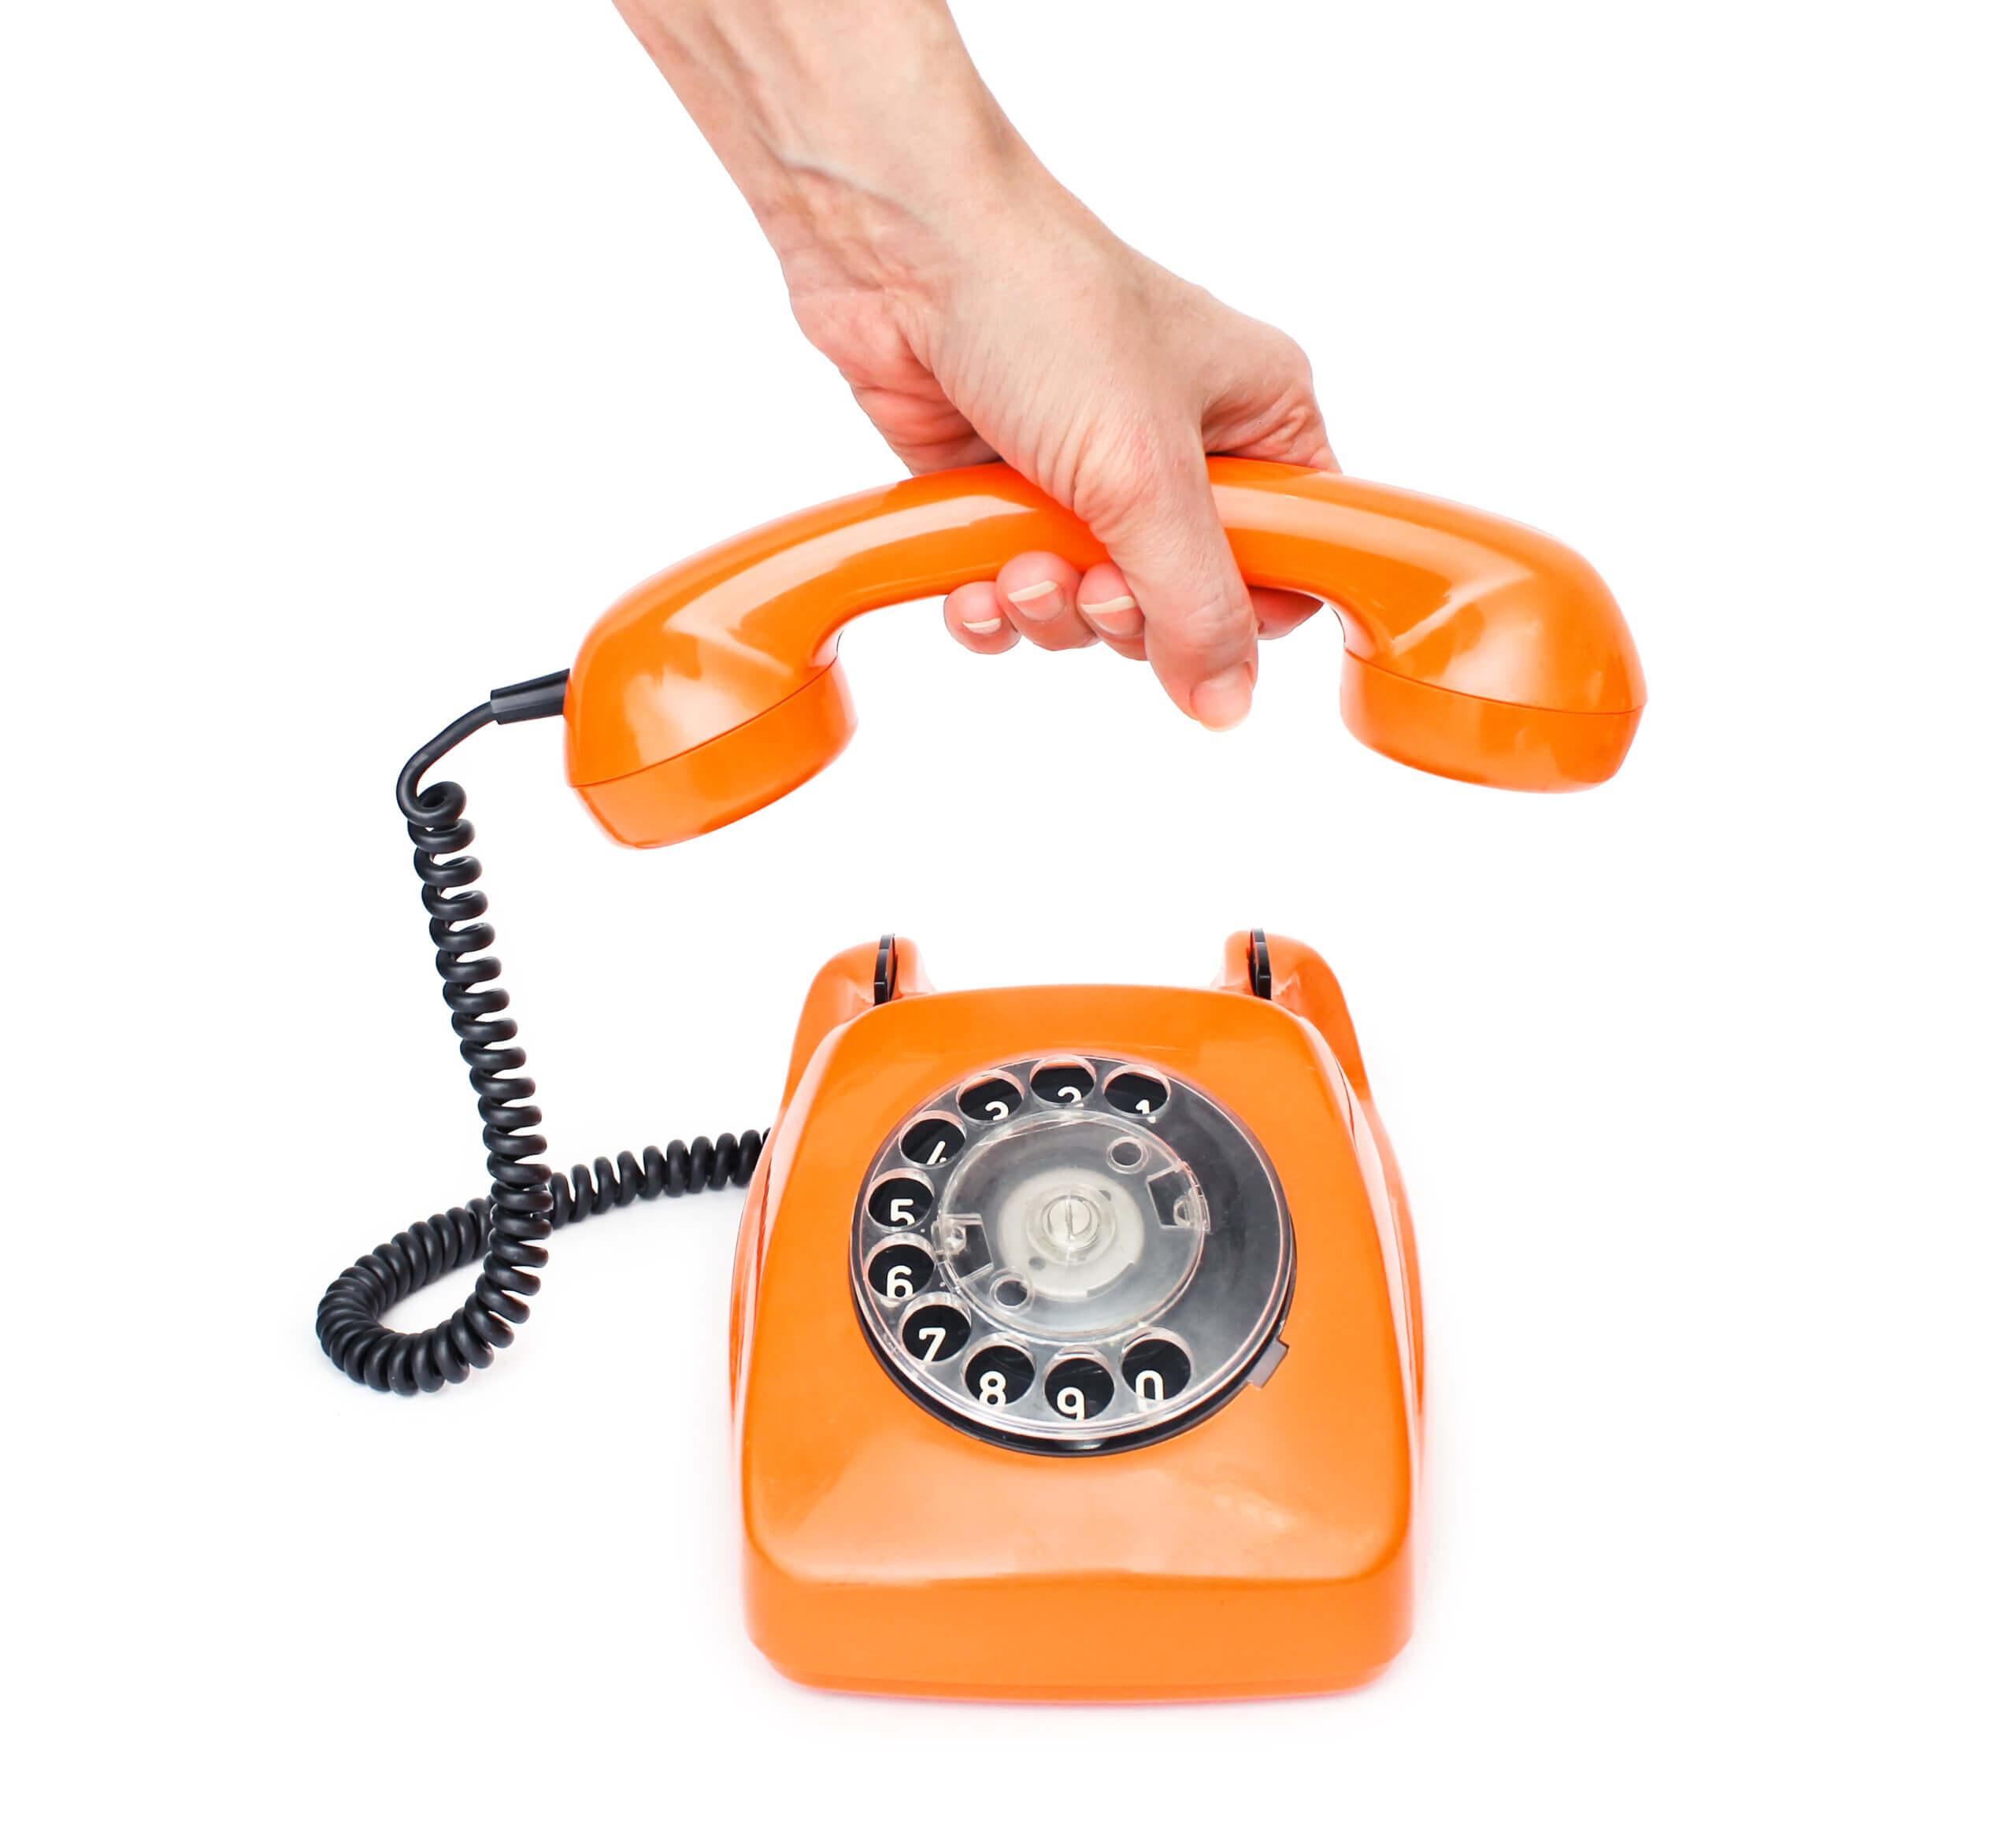 ein orangenes Telefon